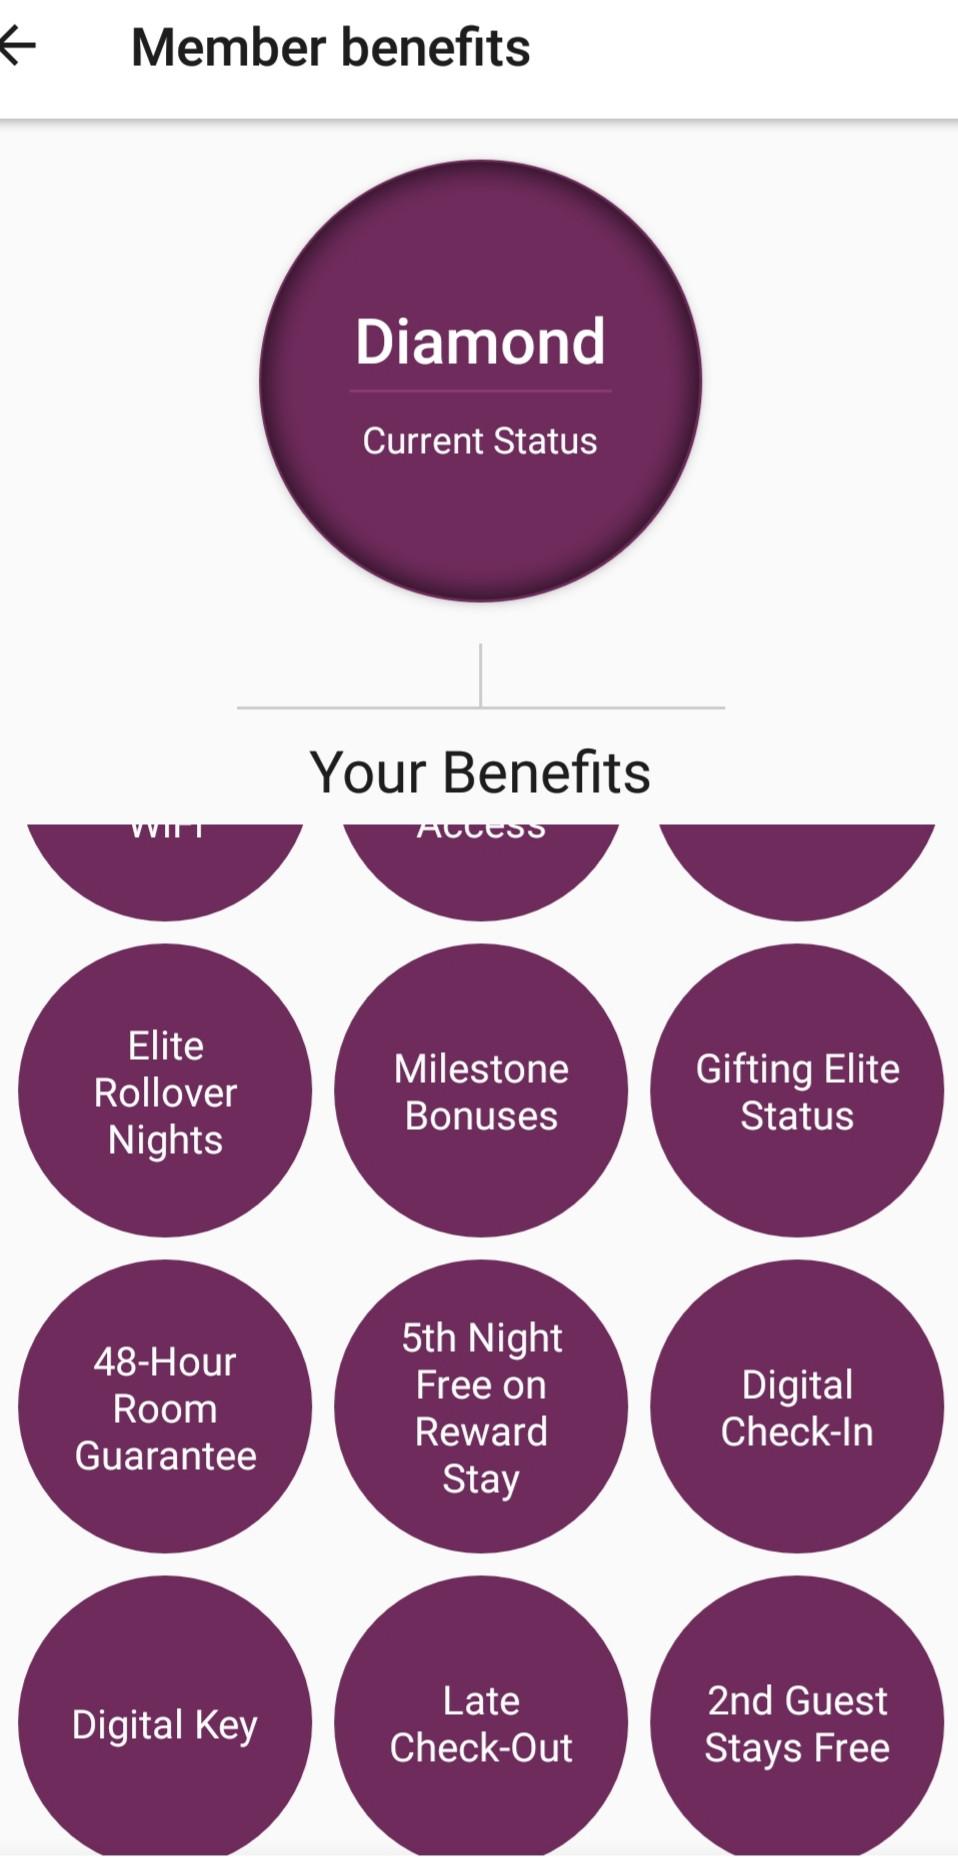 Hilton Diamond Status Benefits